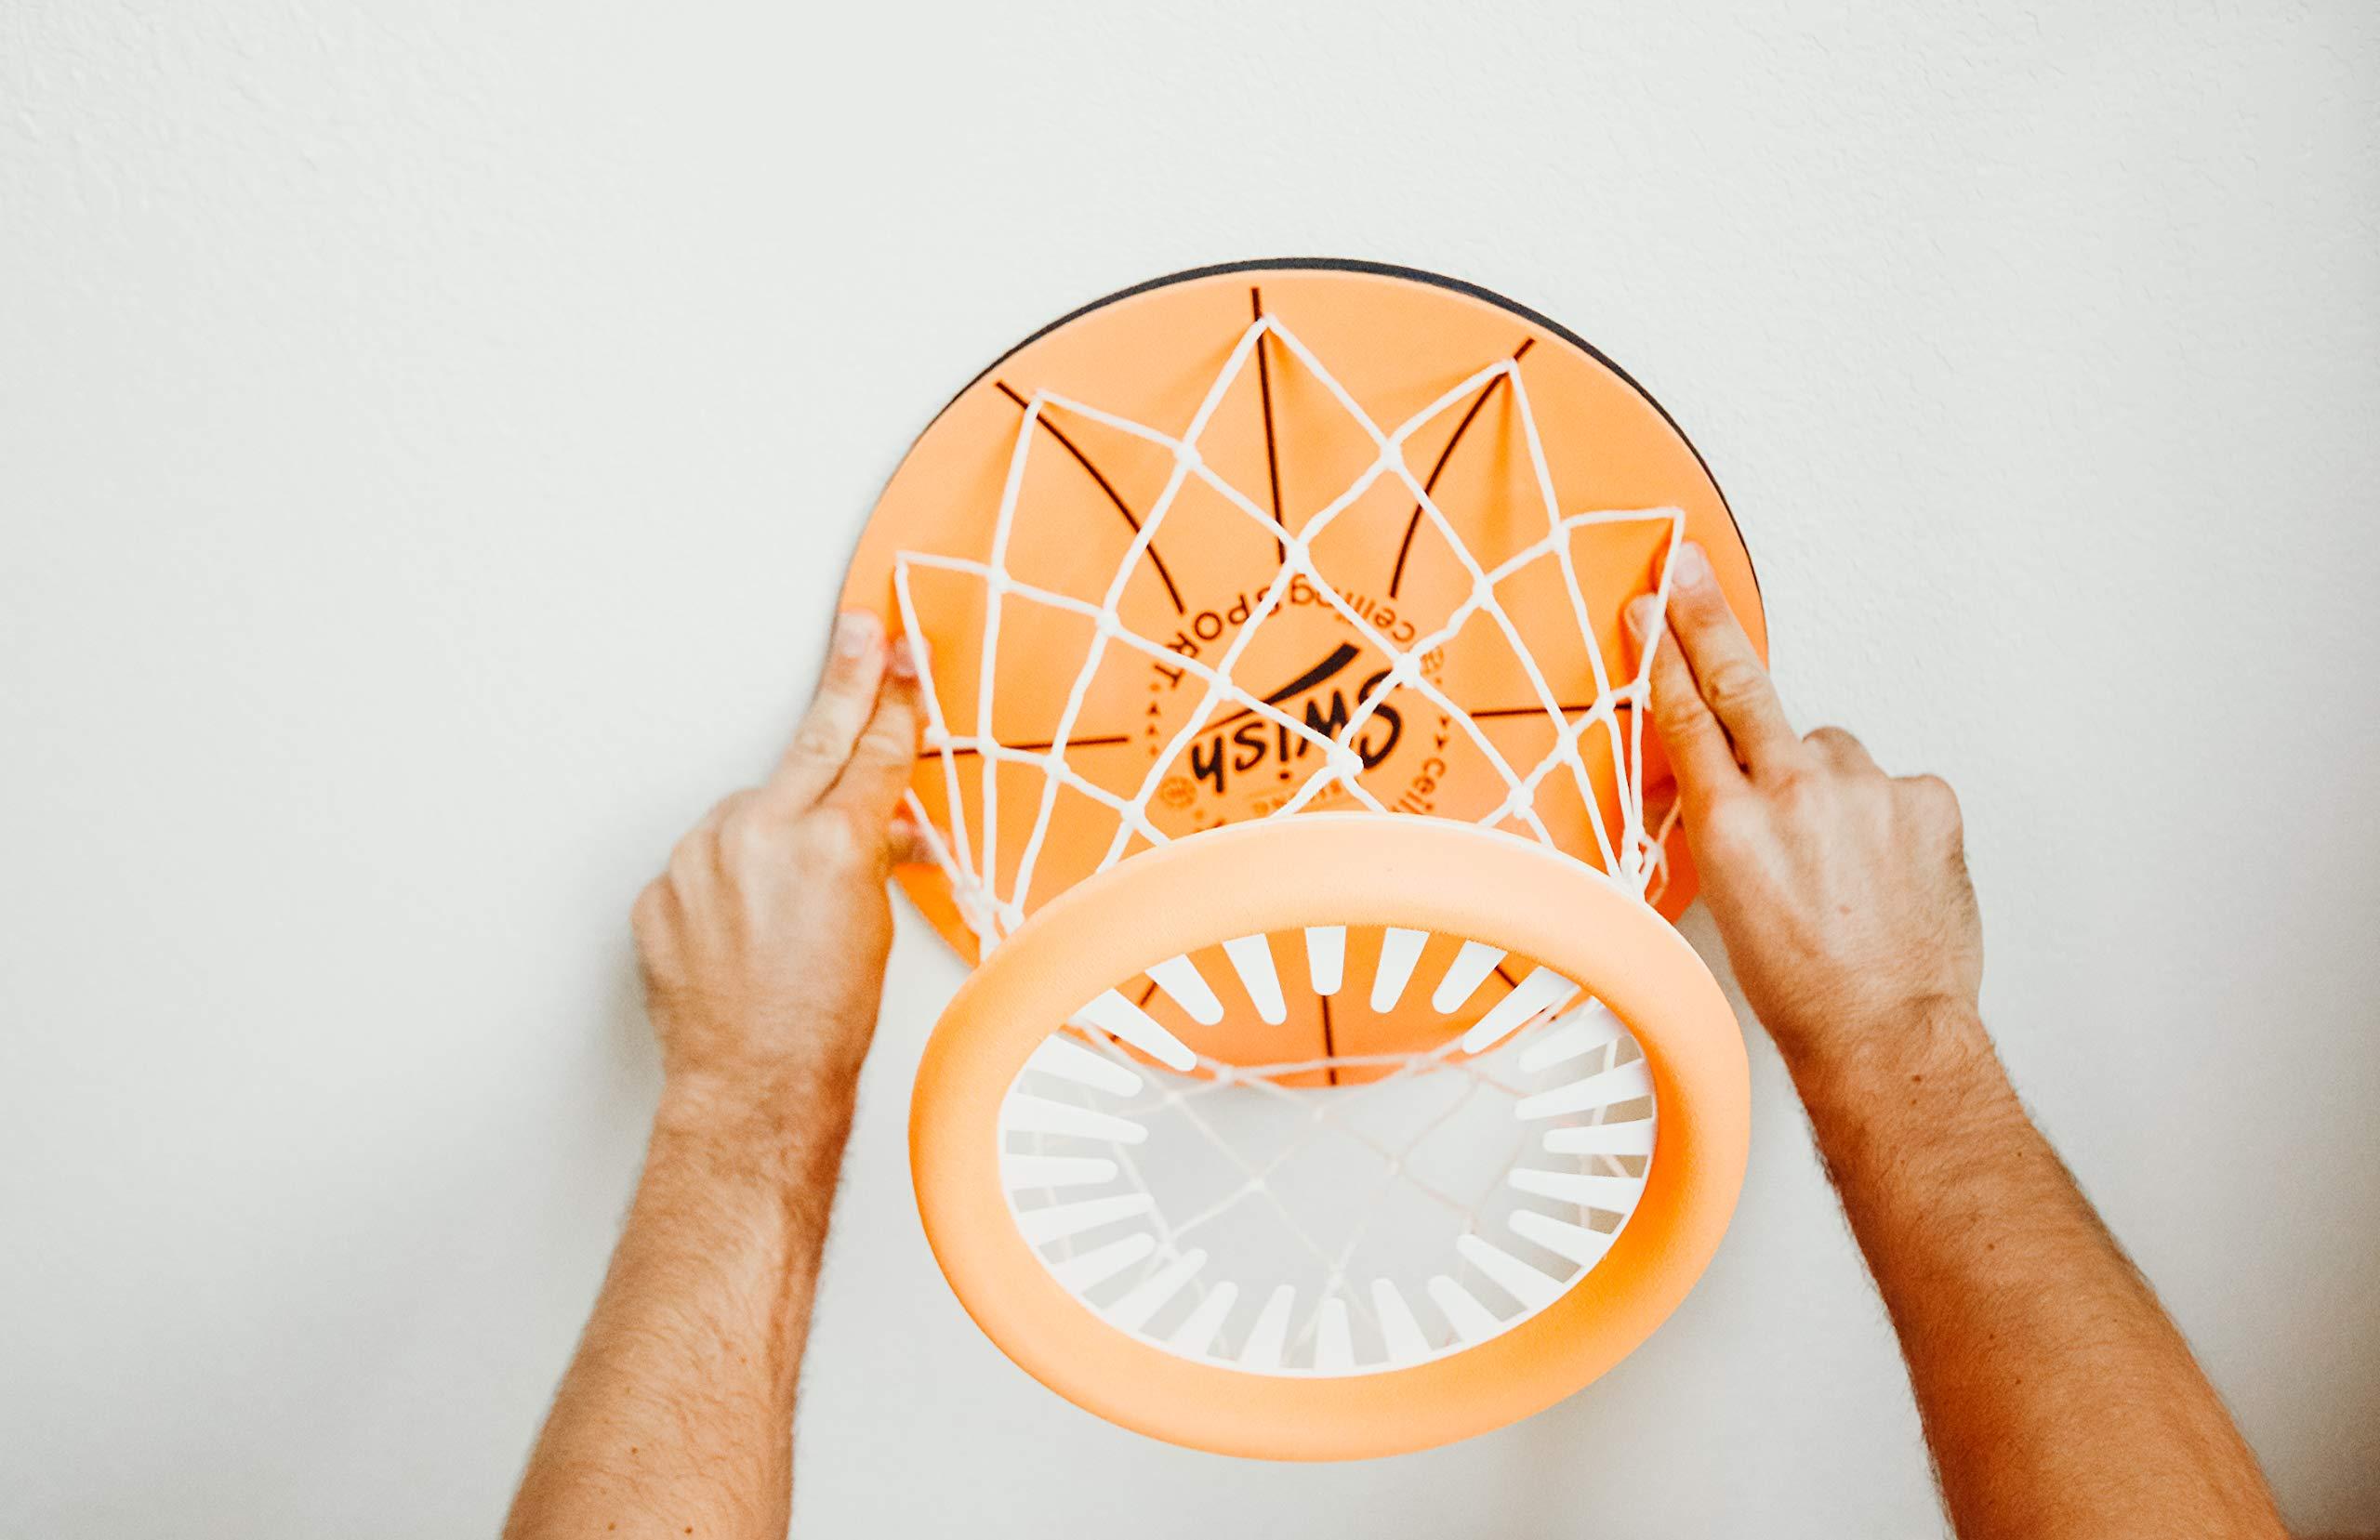 Ceiling Sport: Indoor Mini Basketball Hoop for Kids Toy Game - Includes Basketball Net Backboard and Mini Basketball by CEILING SPORT